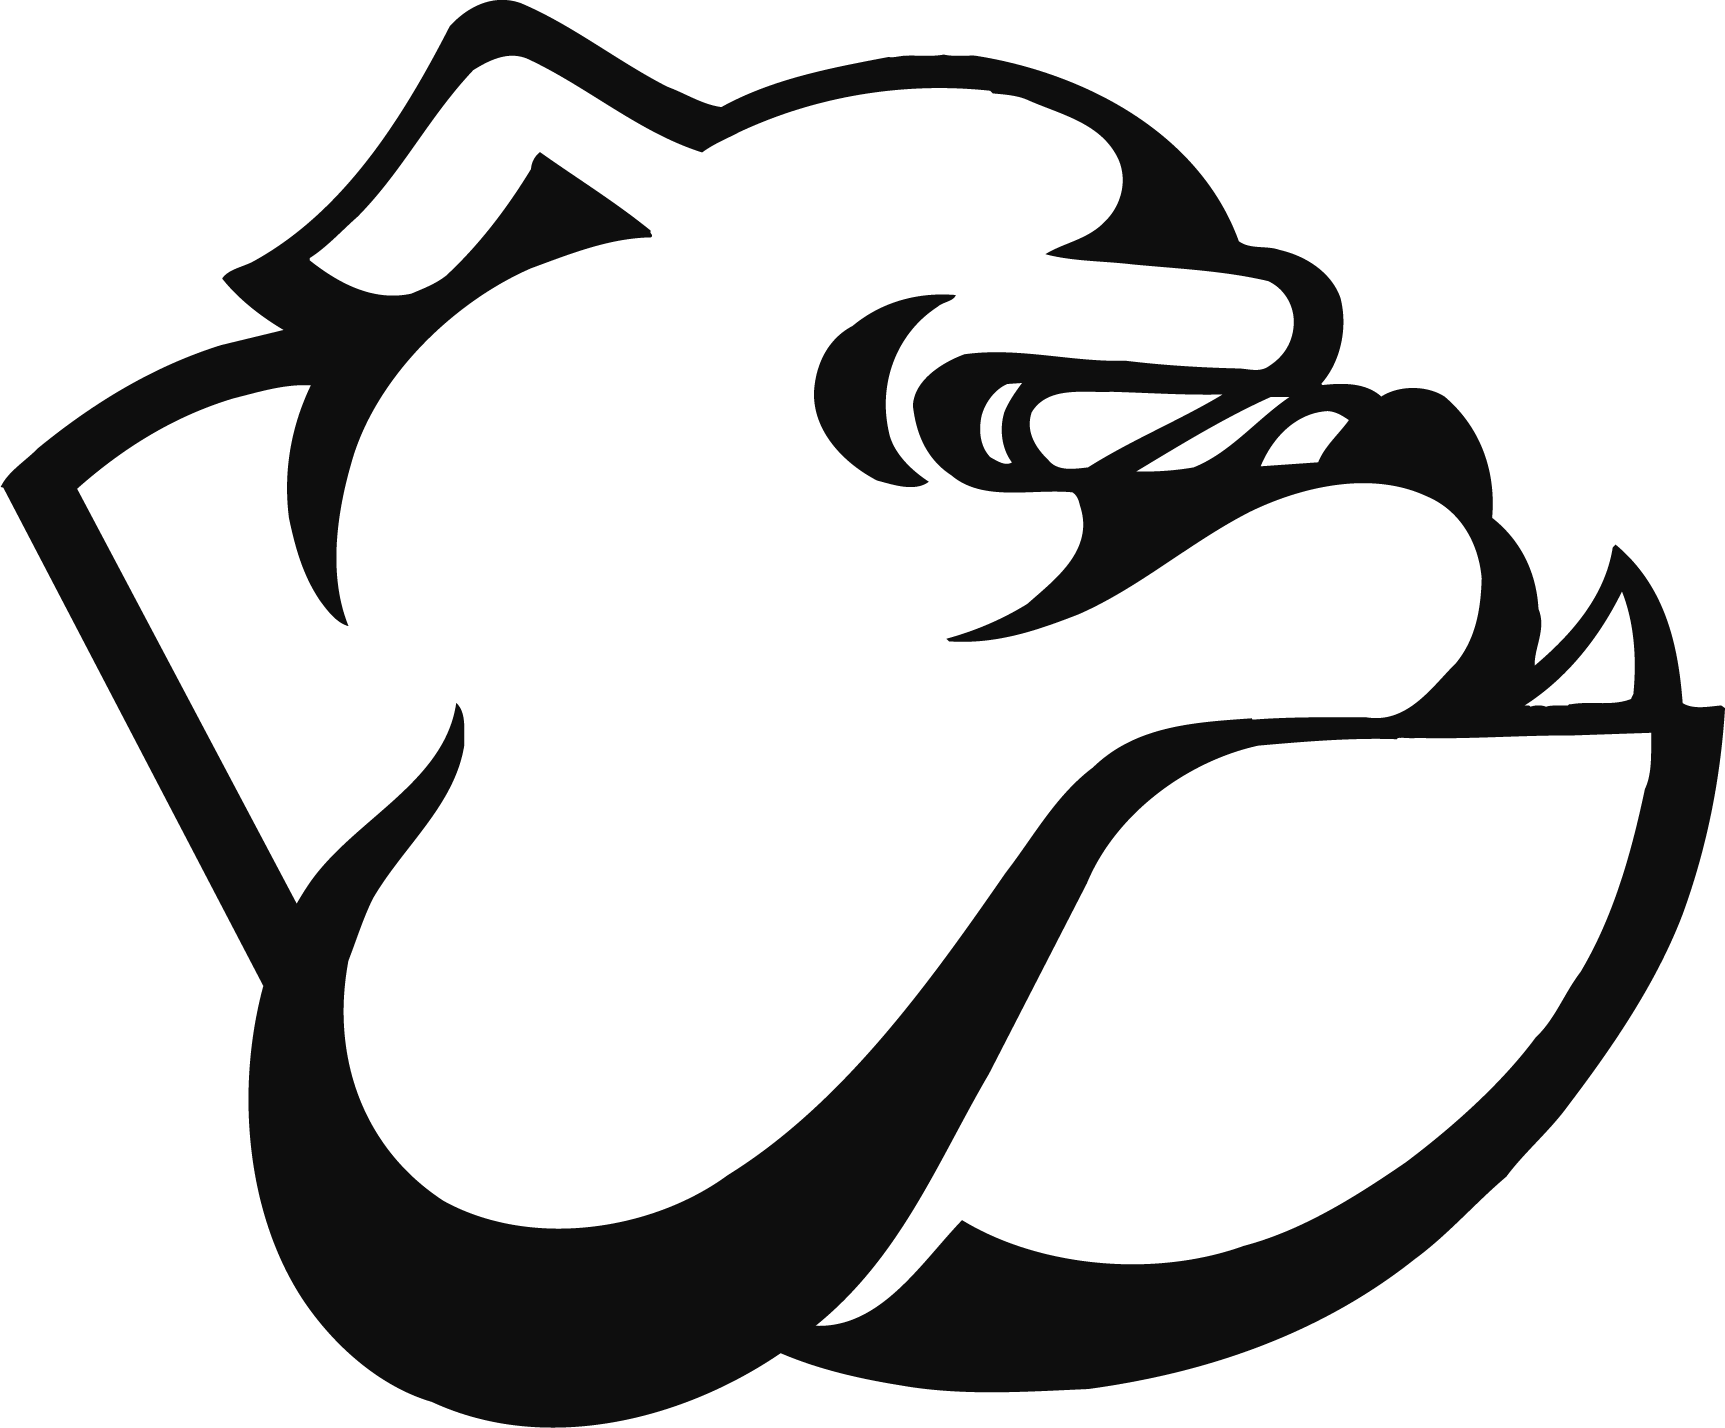 hight resolution of garfield bulldog clipart